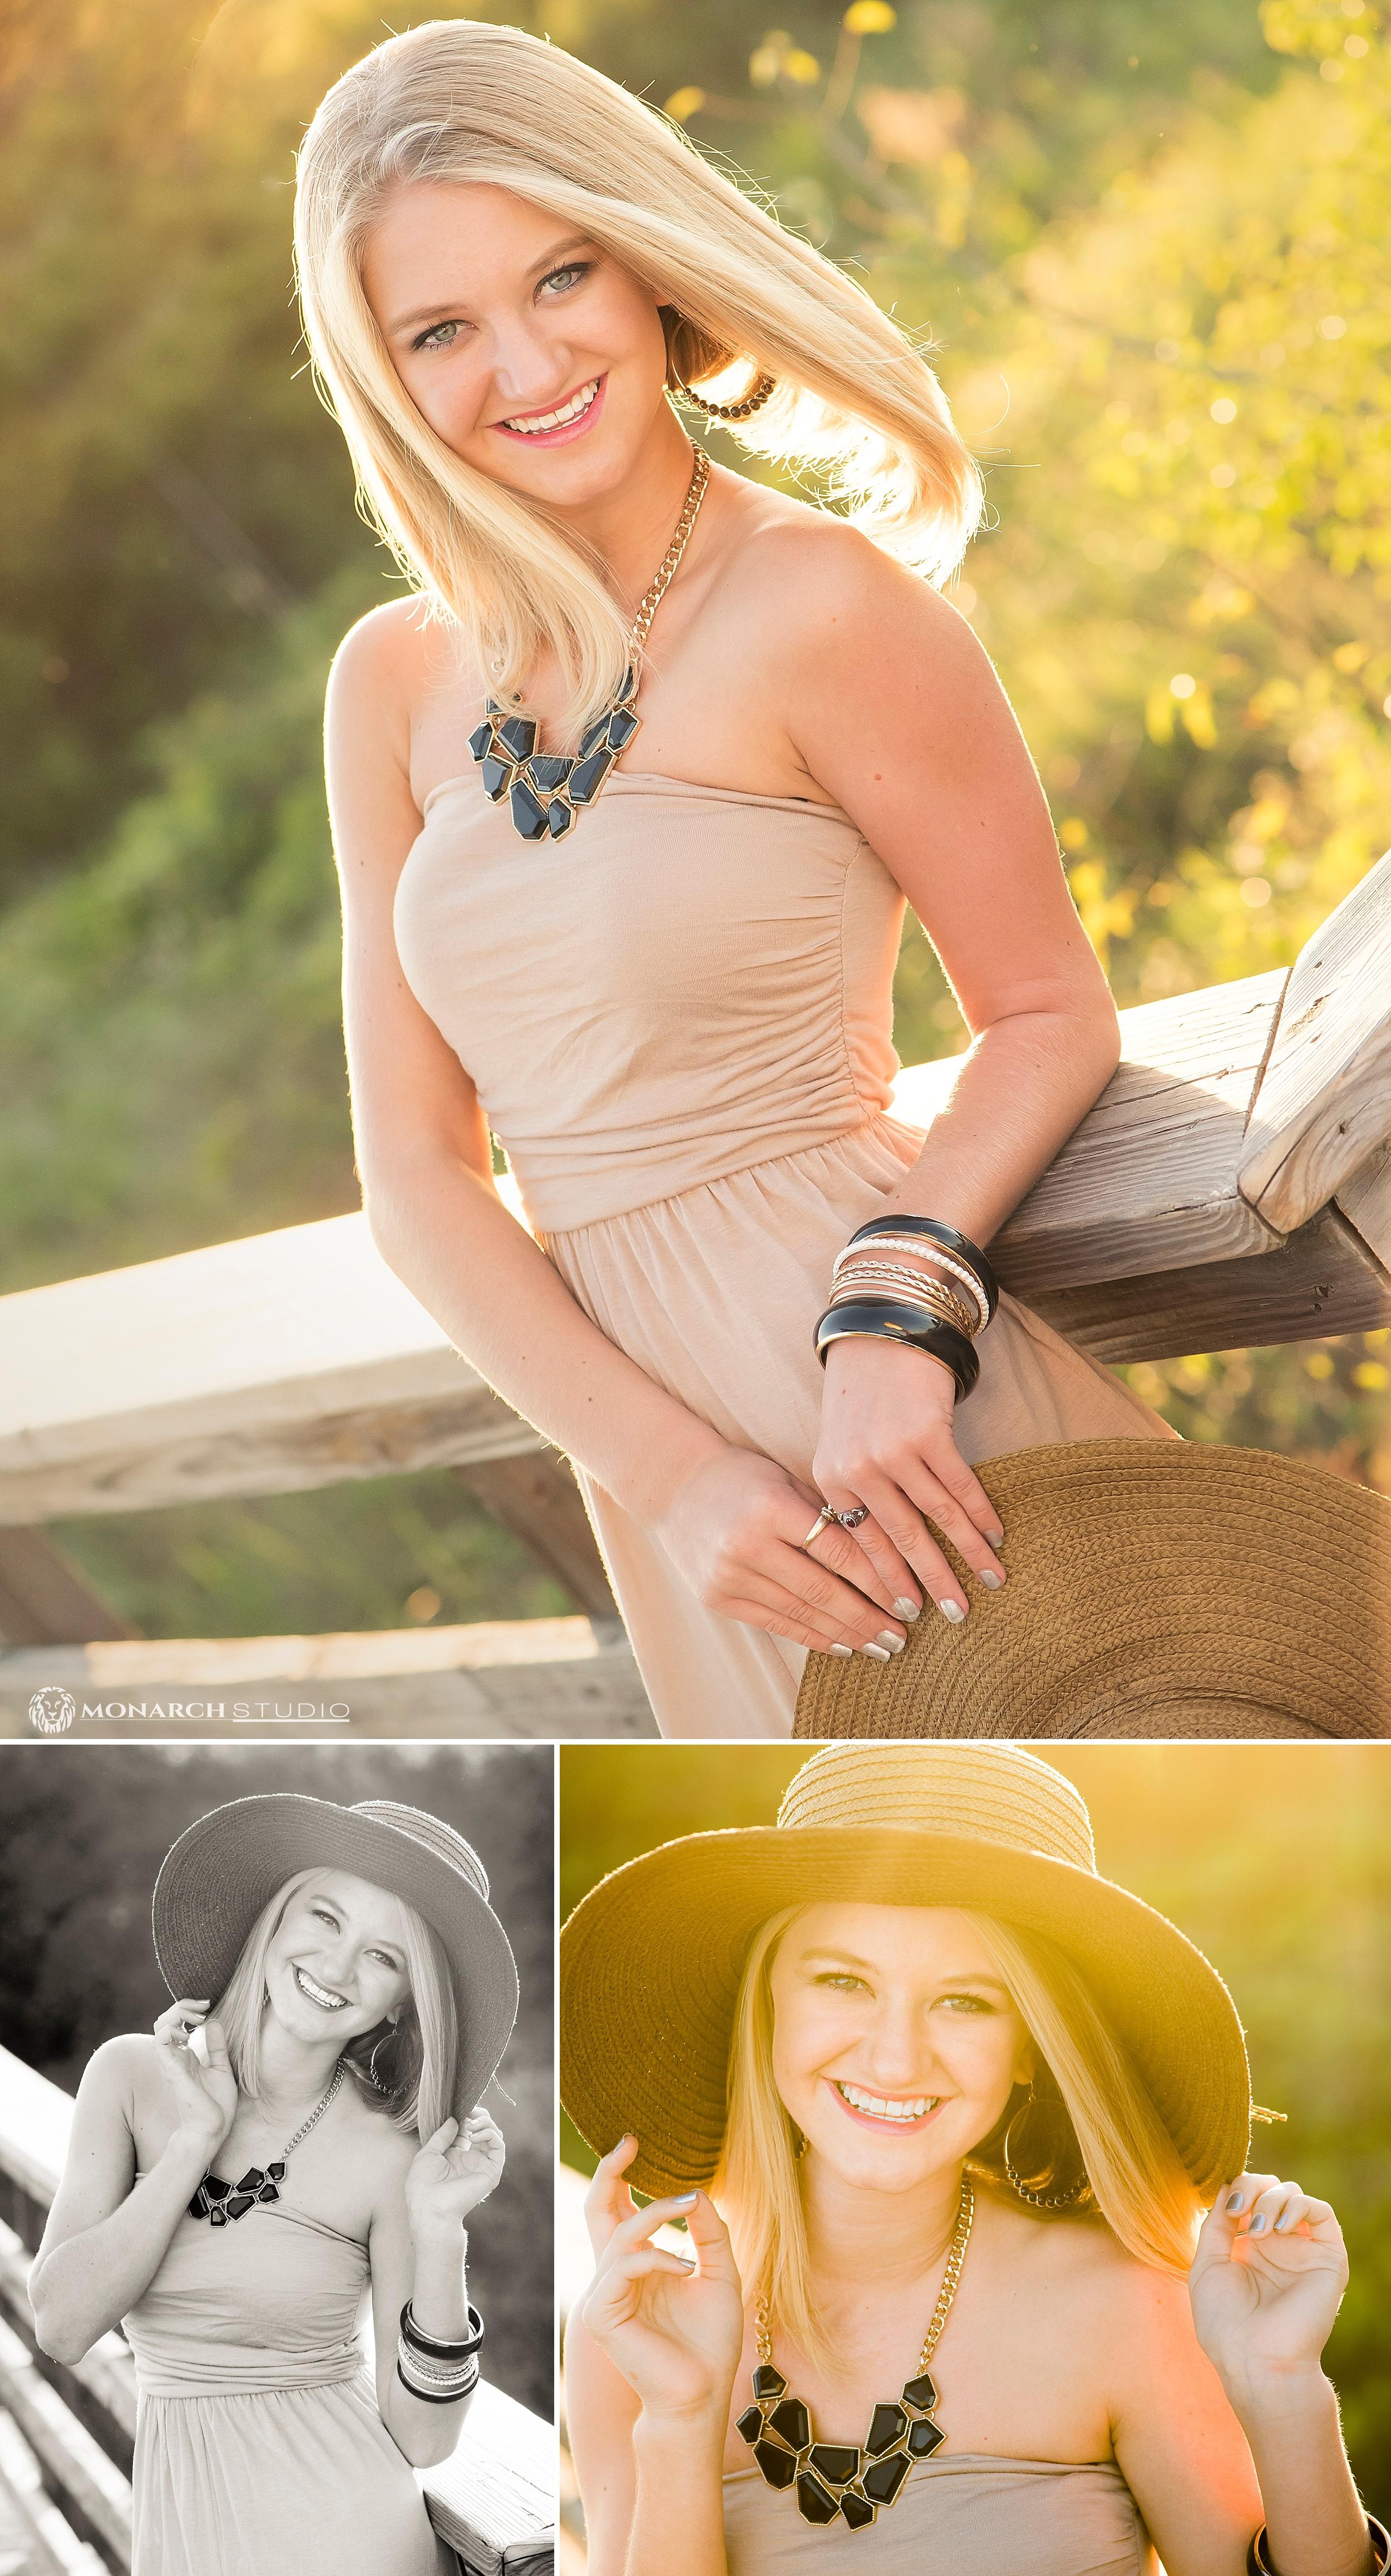 st-auggustine-senior-portraits-2016-09-13_0002.jpg